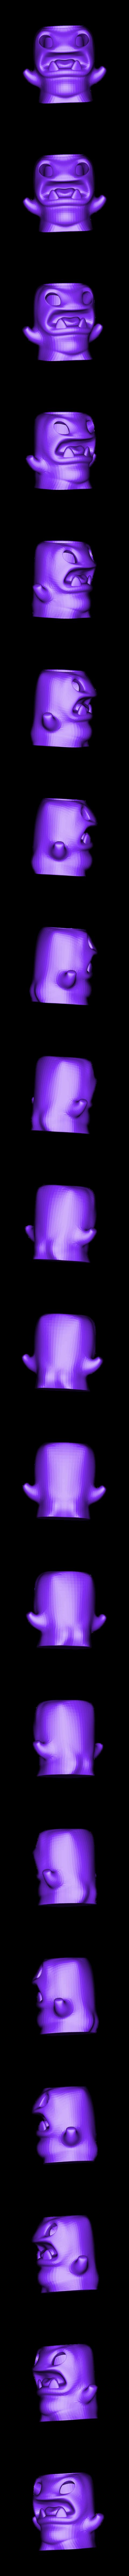 monster_pencilpot.stl Download free STL file Pencilpot Monster • 3D printable object, Cults